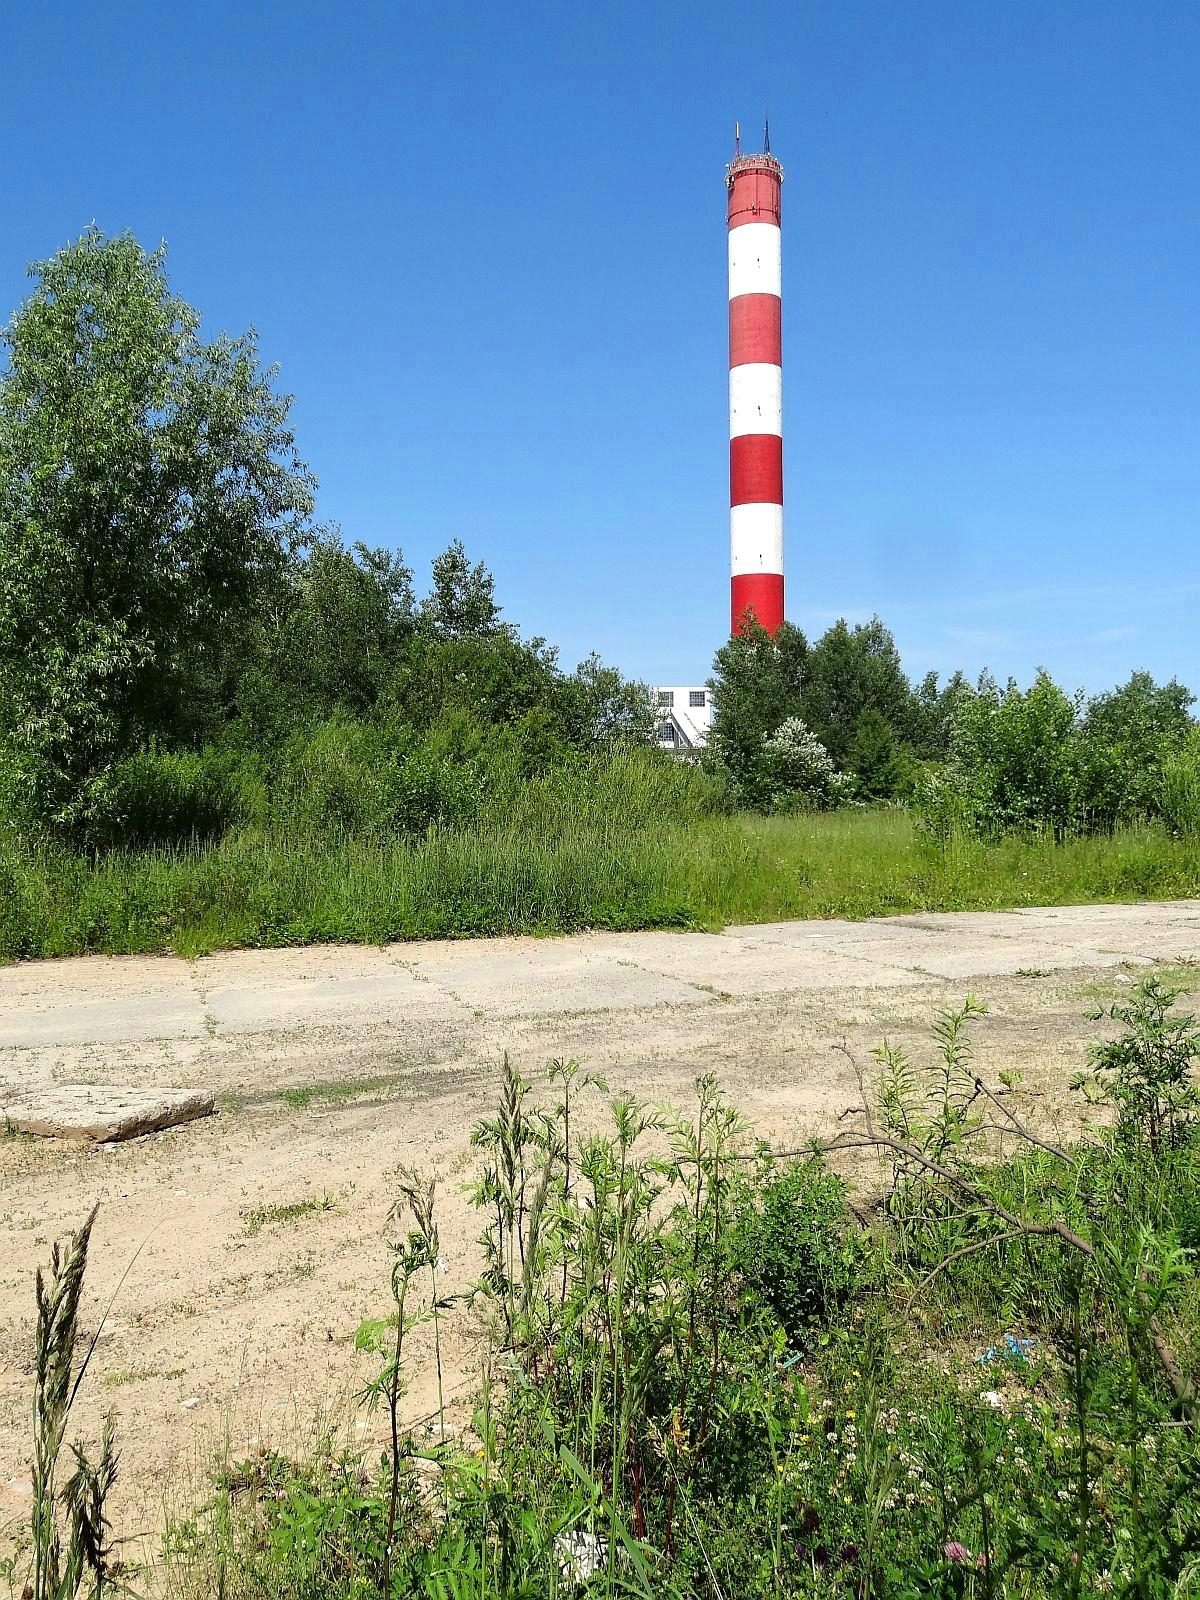 Komin Elektrociepłowni Kielce